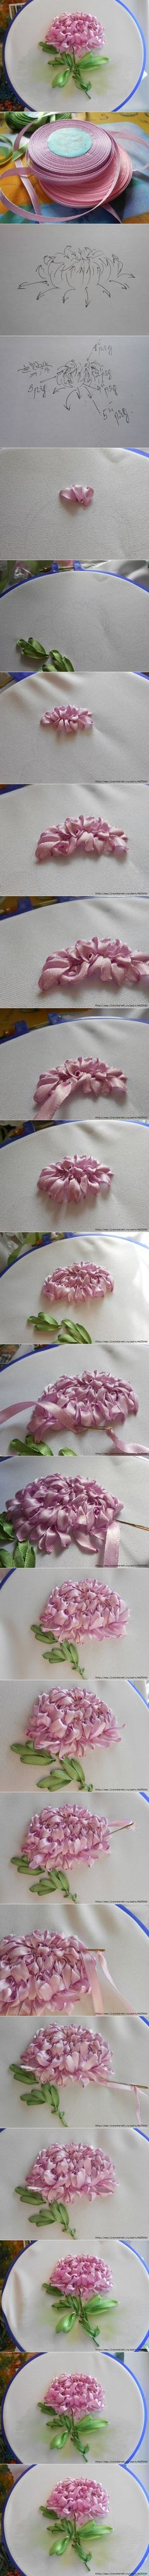 DIY Ribbon Embroidery Chrysanthemum | www.FabArtDIY.com LIKE Us on Facebook ==> https://www.facebook.com/FabArtDIY